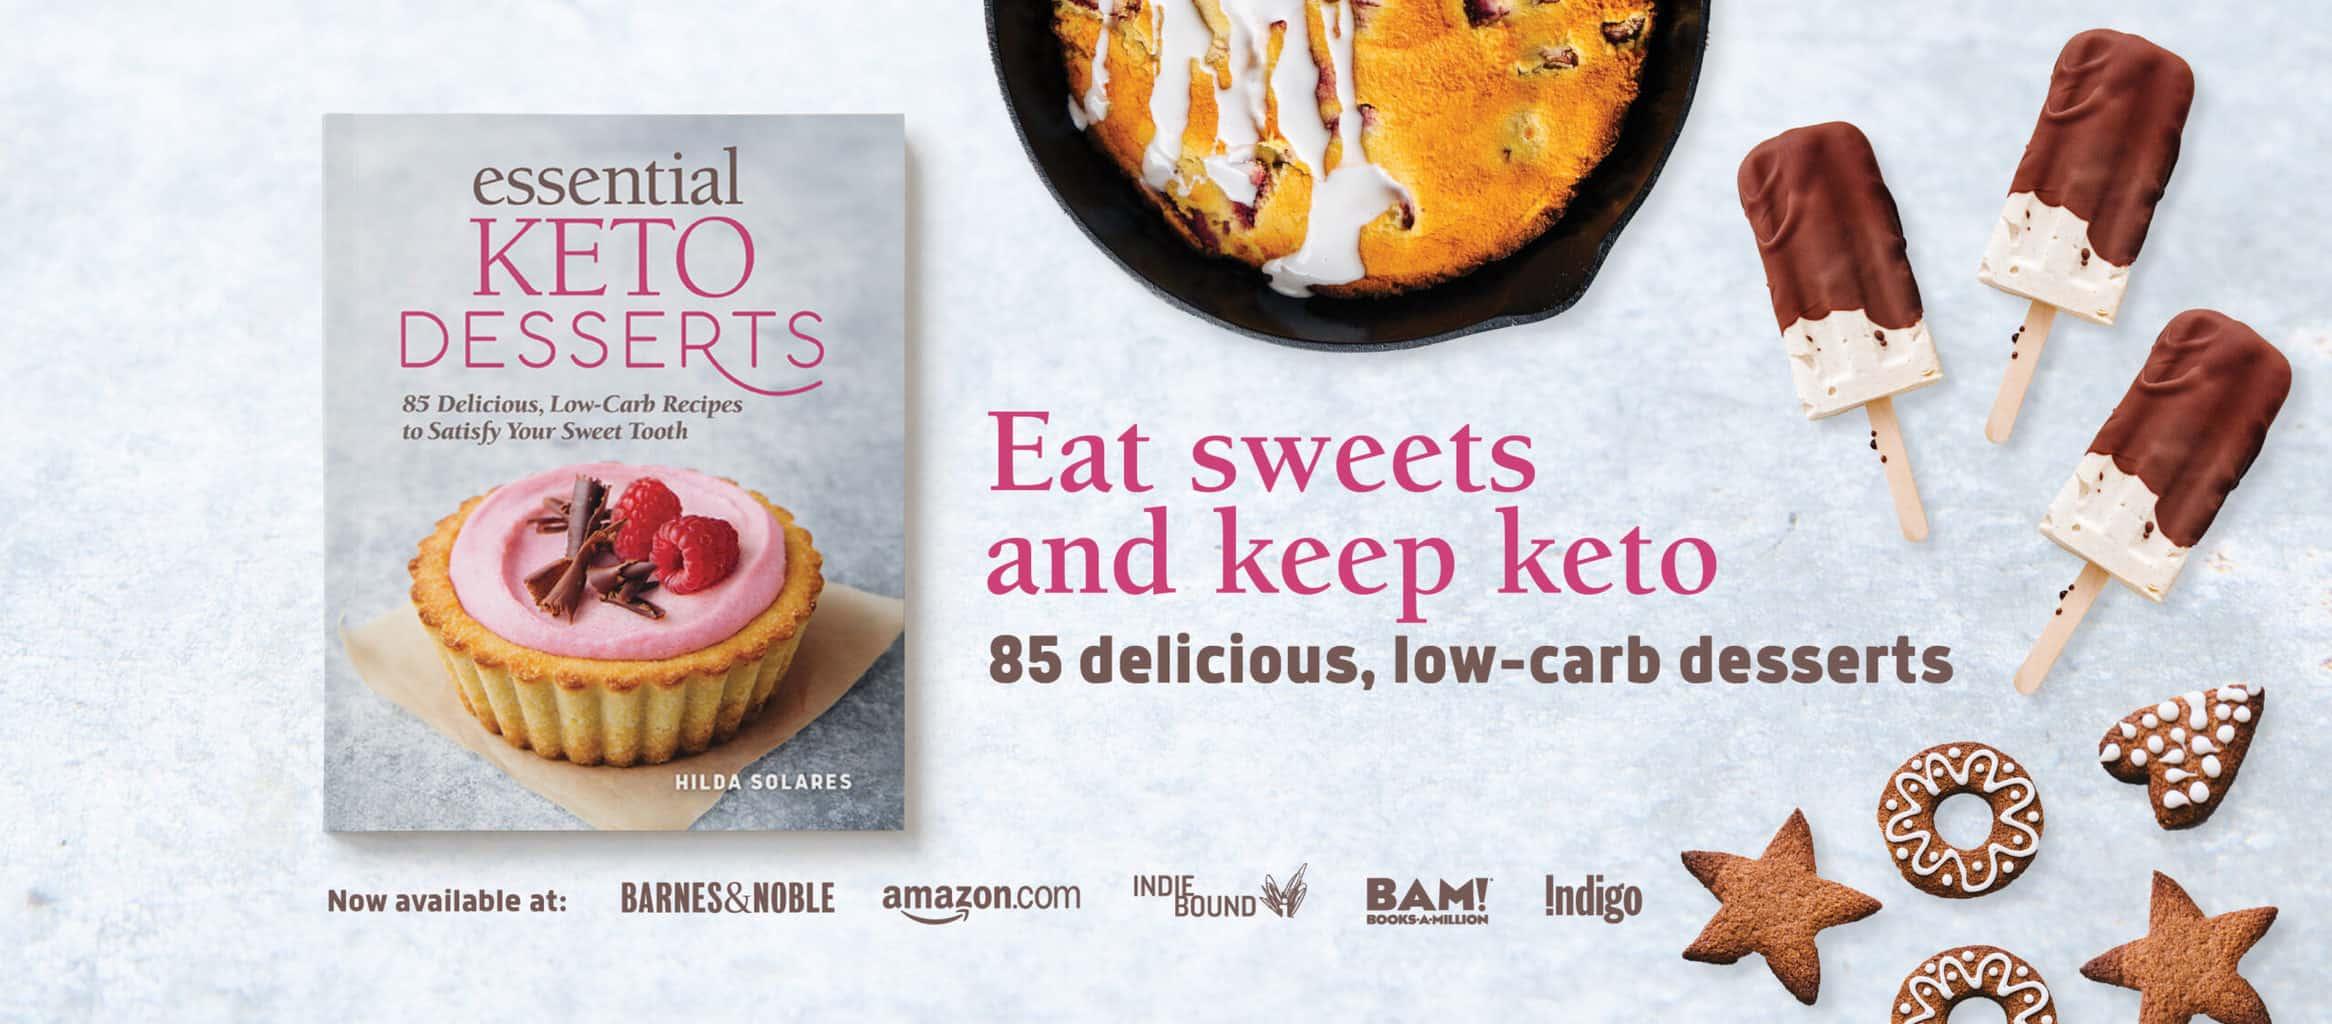 Essential Keto Desserts Book